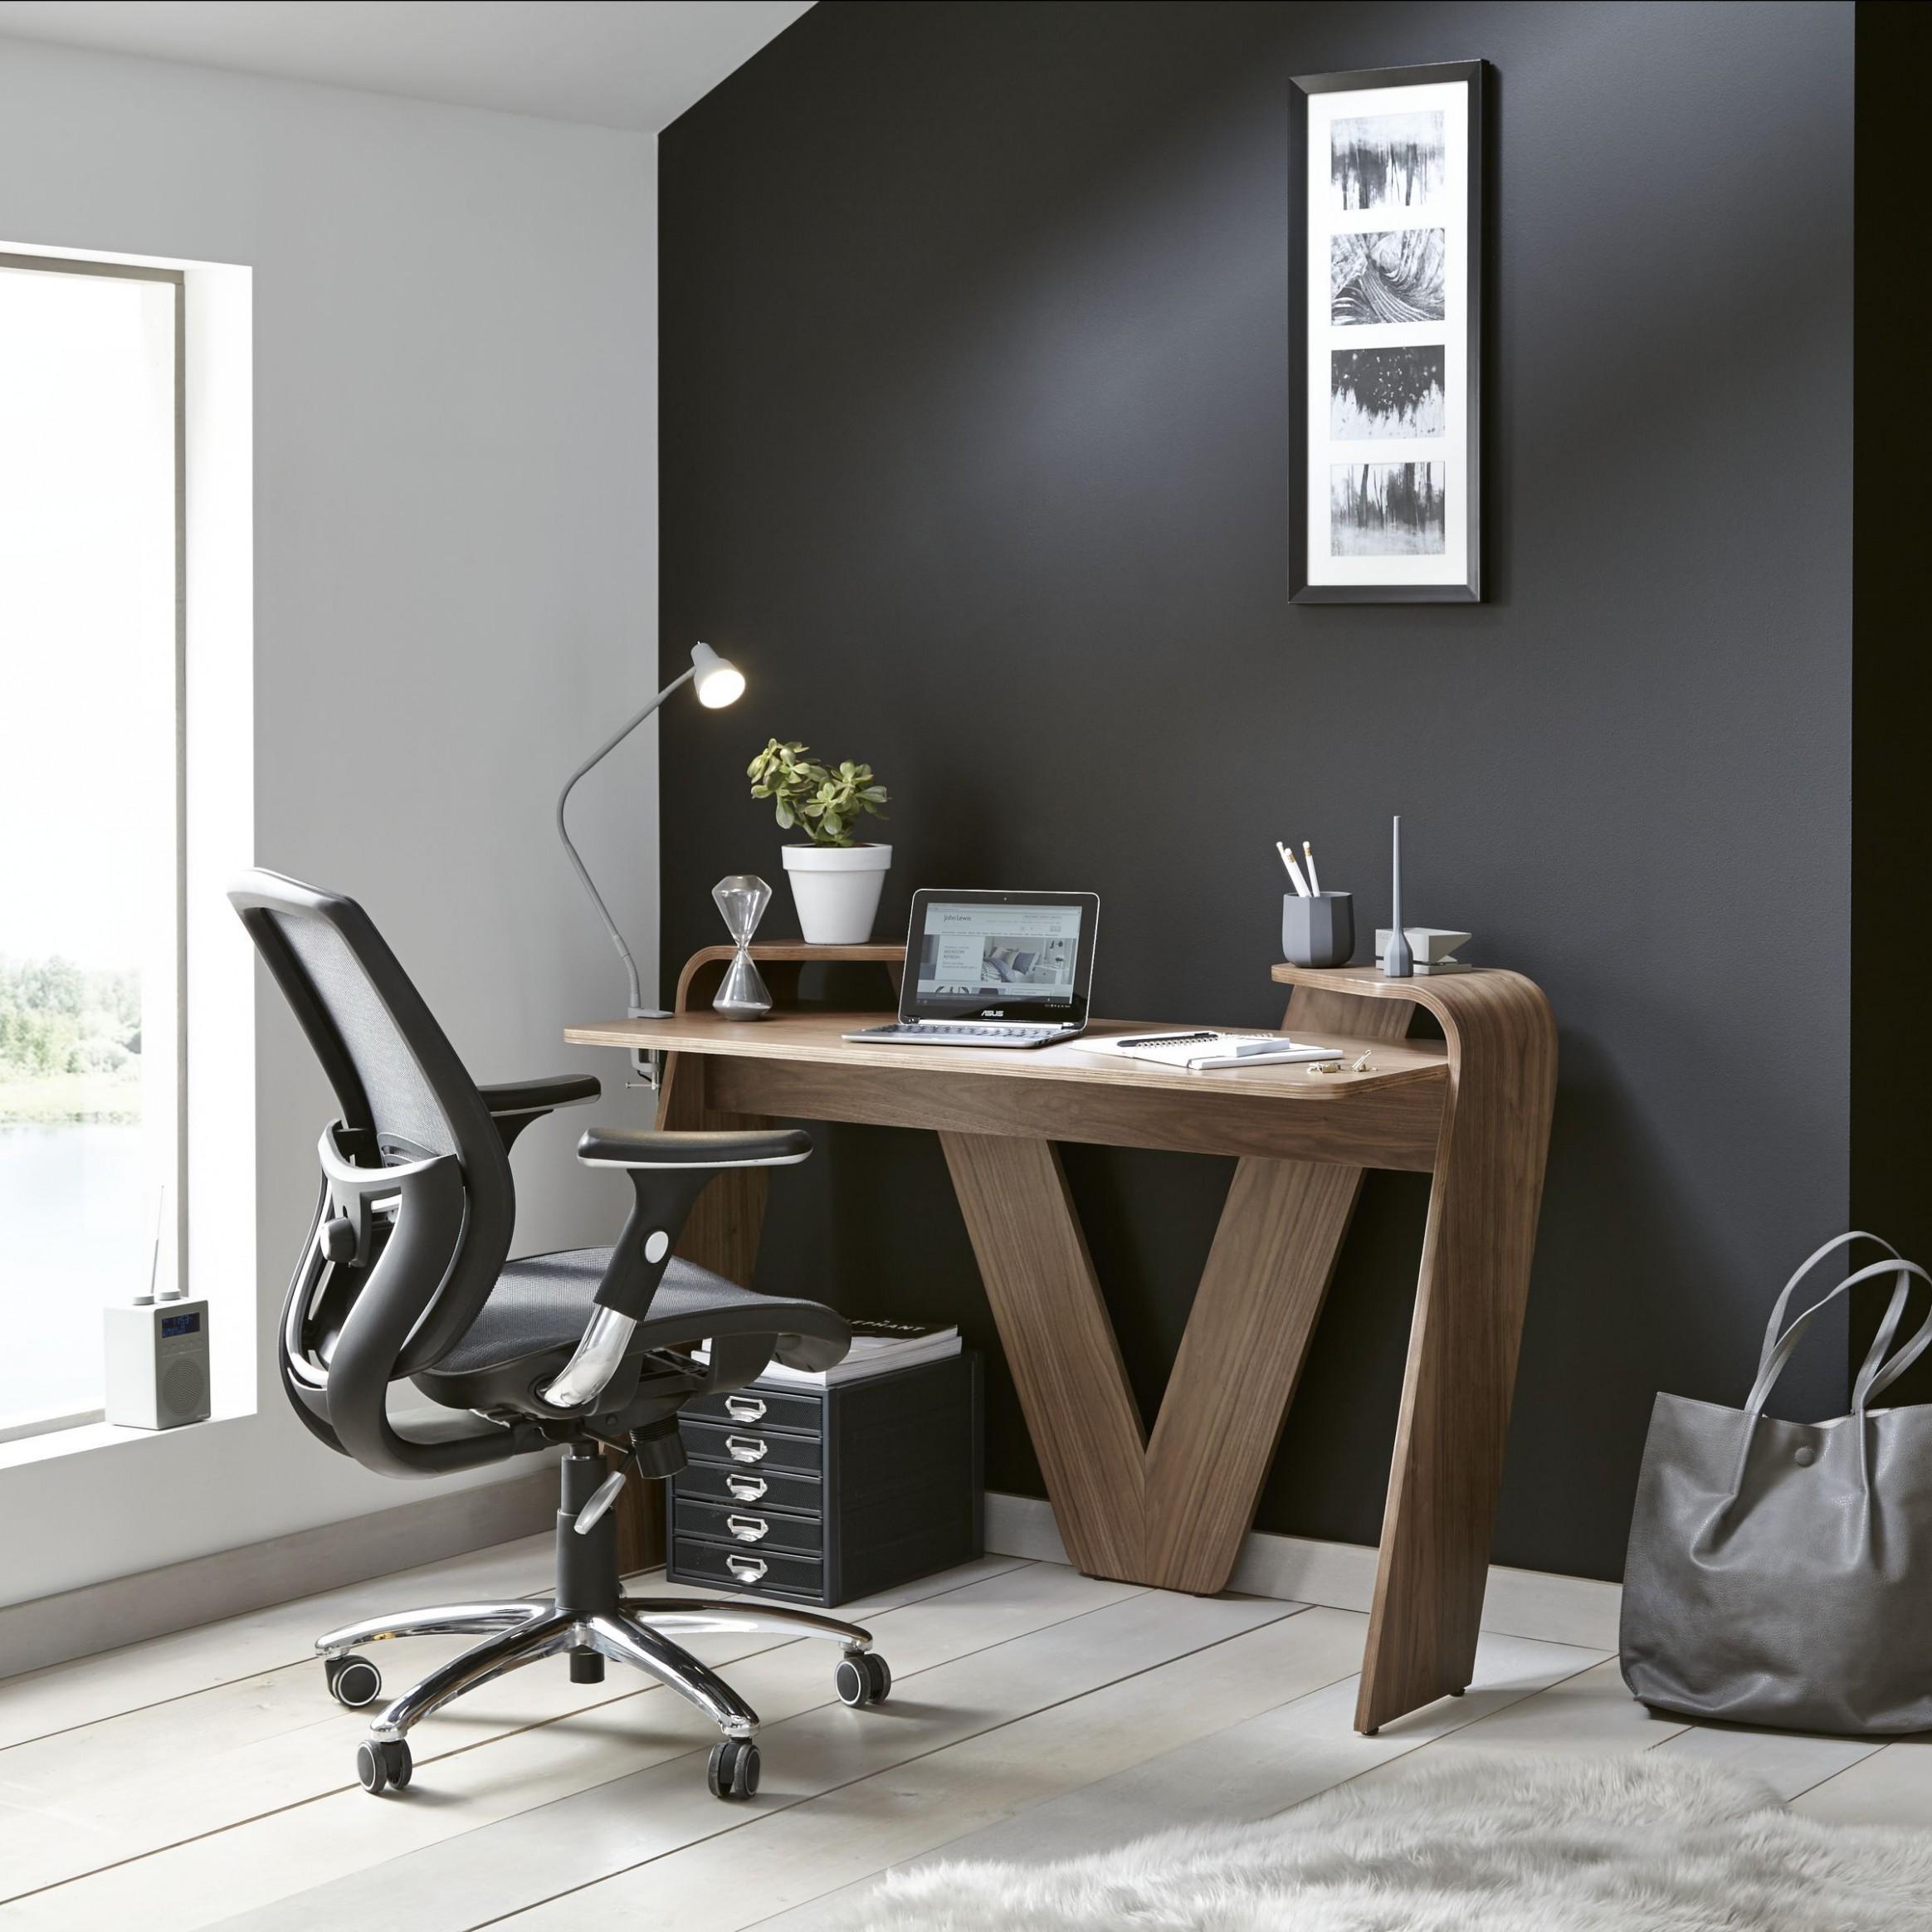 Pin on Office Renovation - John Lewis Home Office Ideas